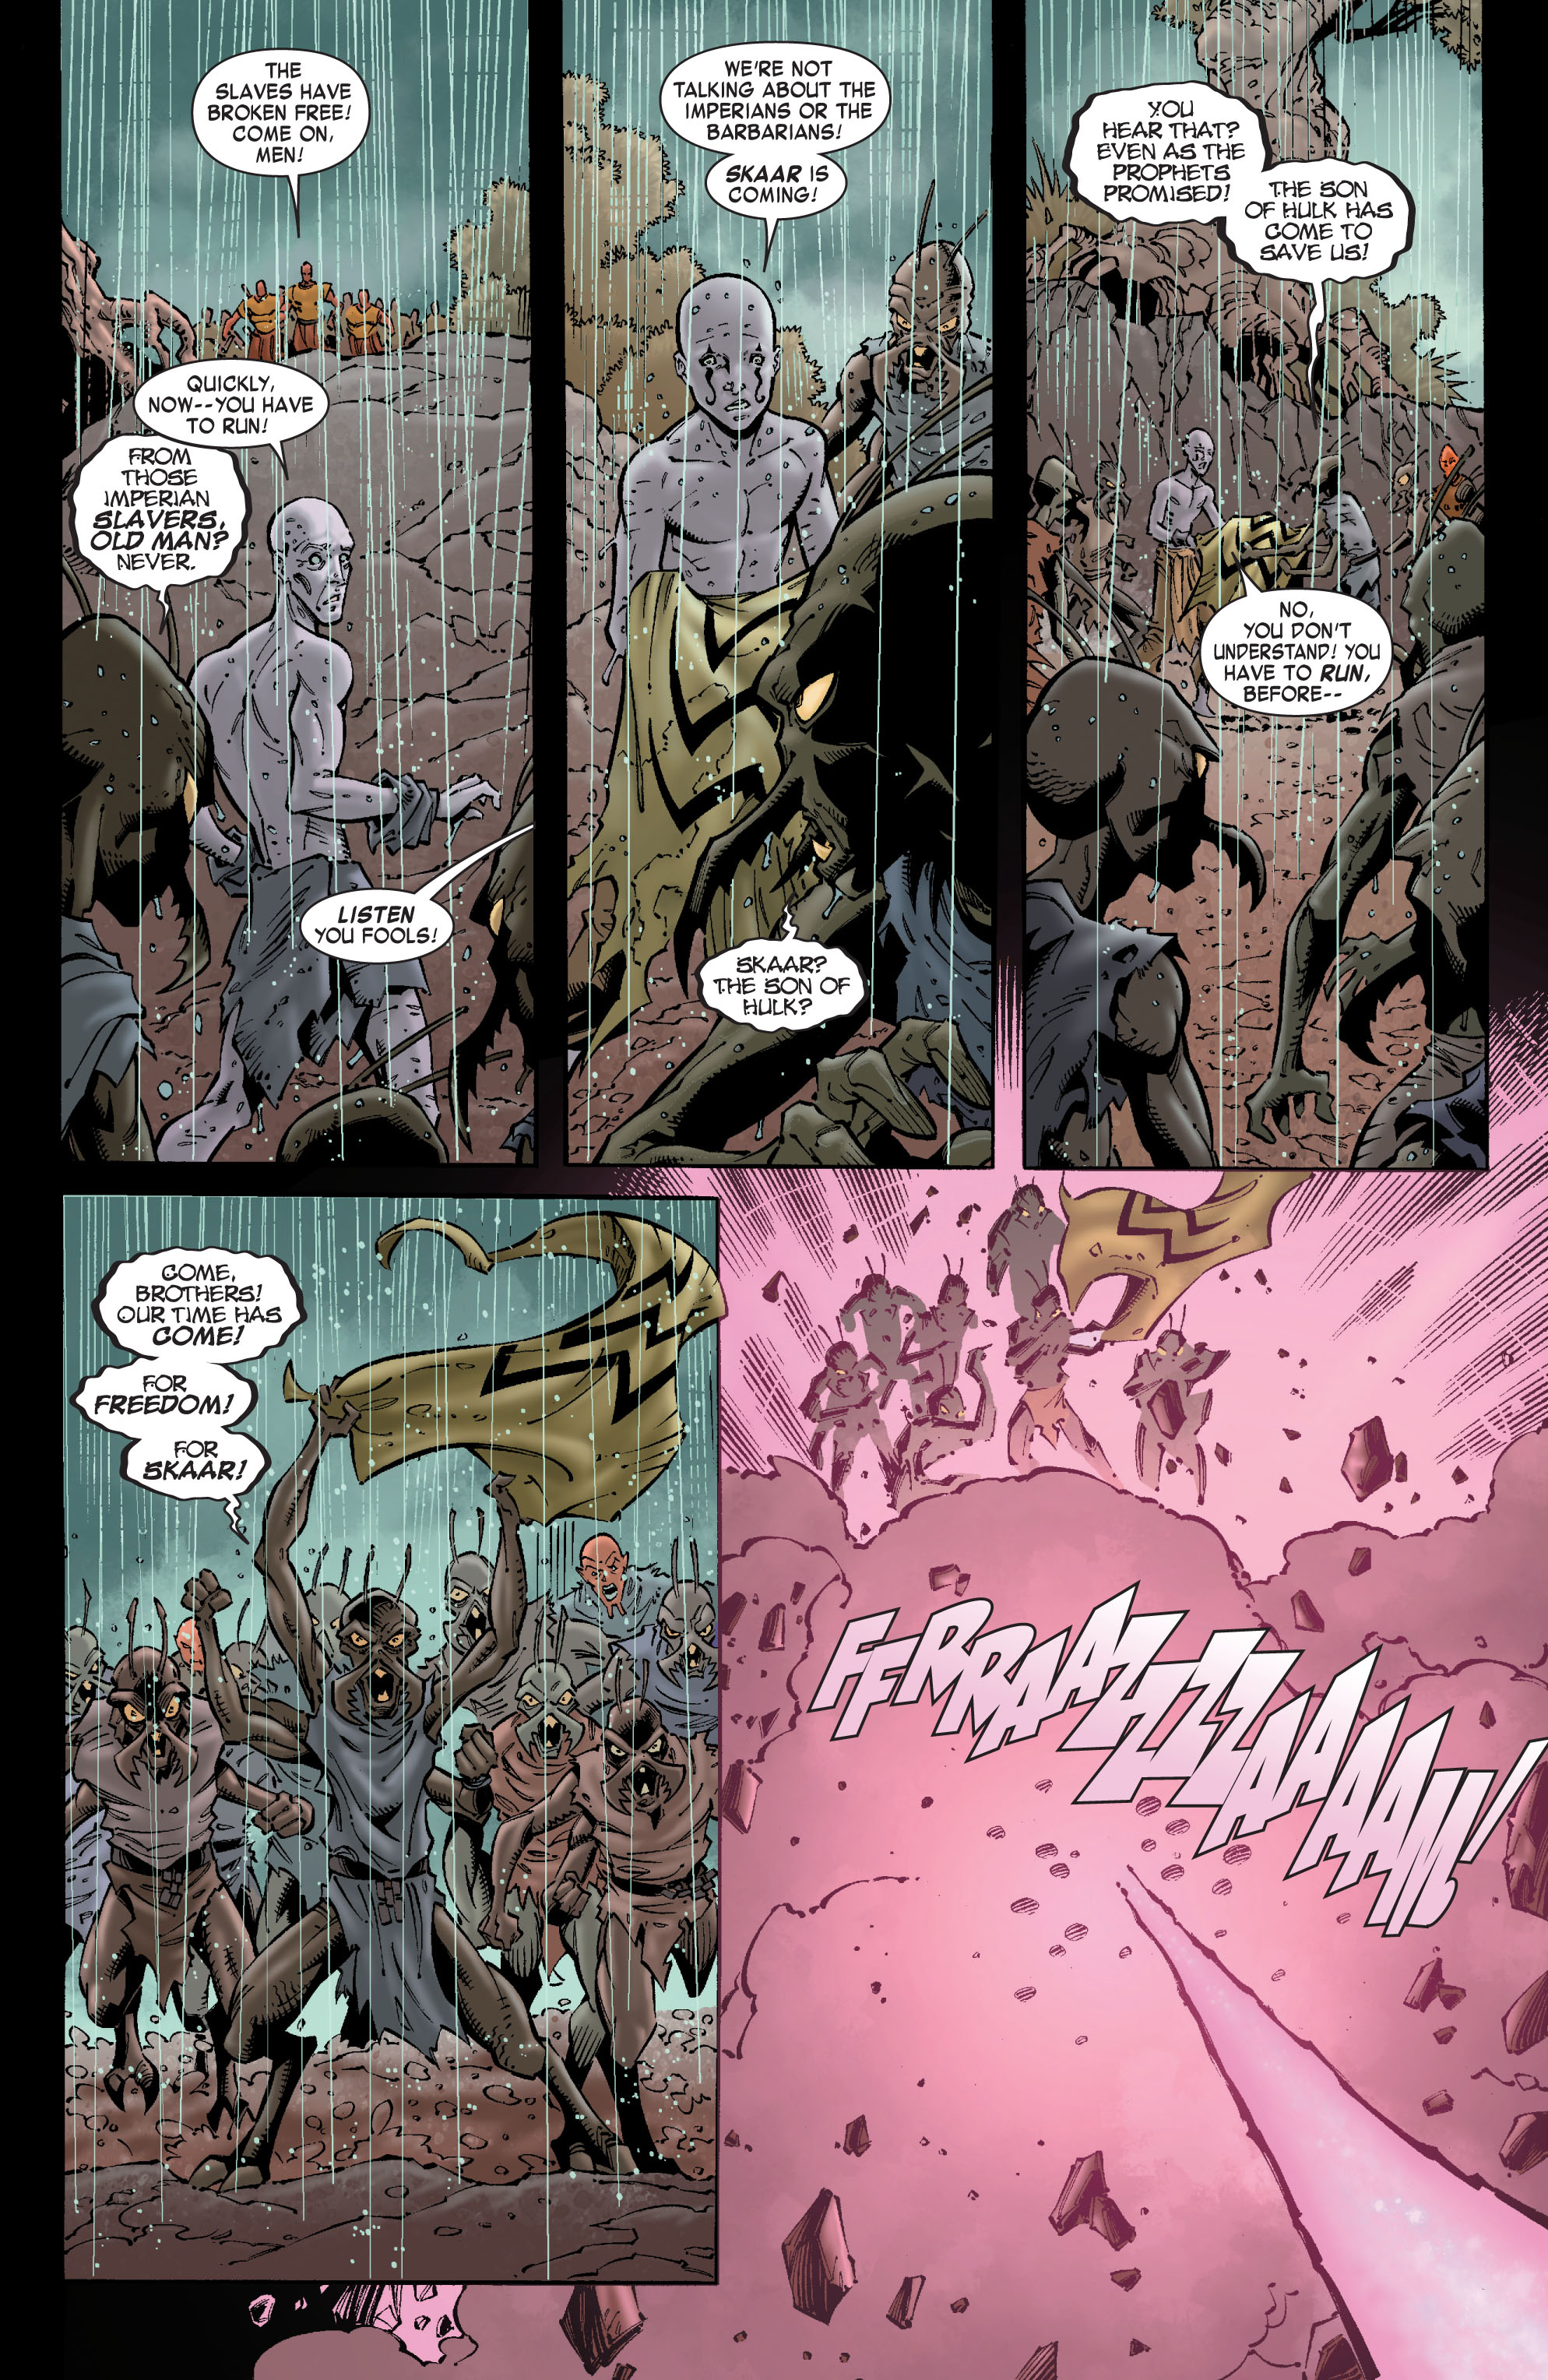 Read online Skaar: Son of Hulk comic -  Issue #8 - 4